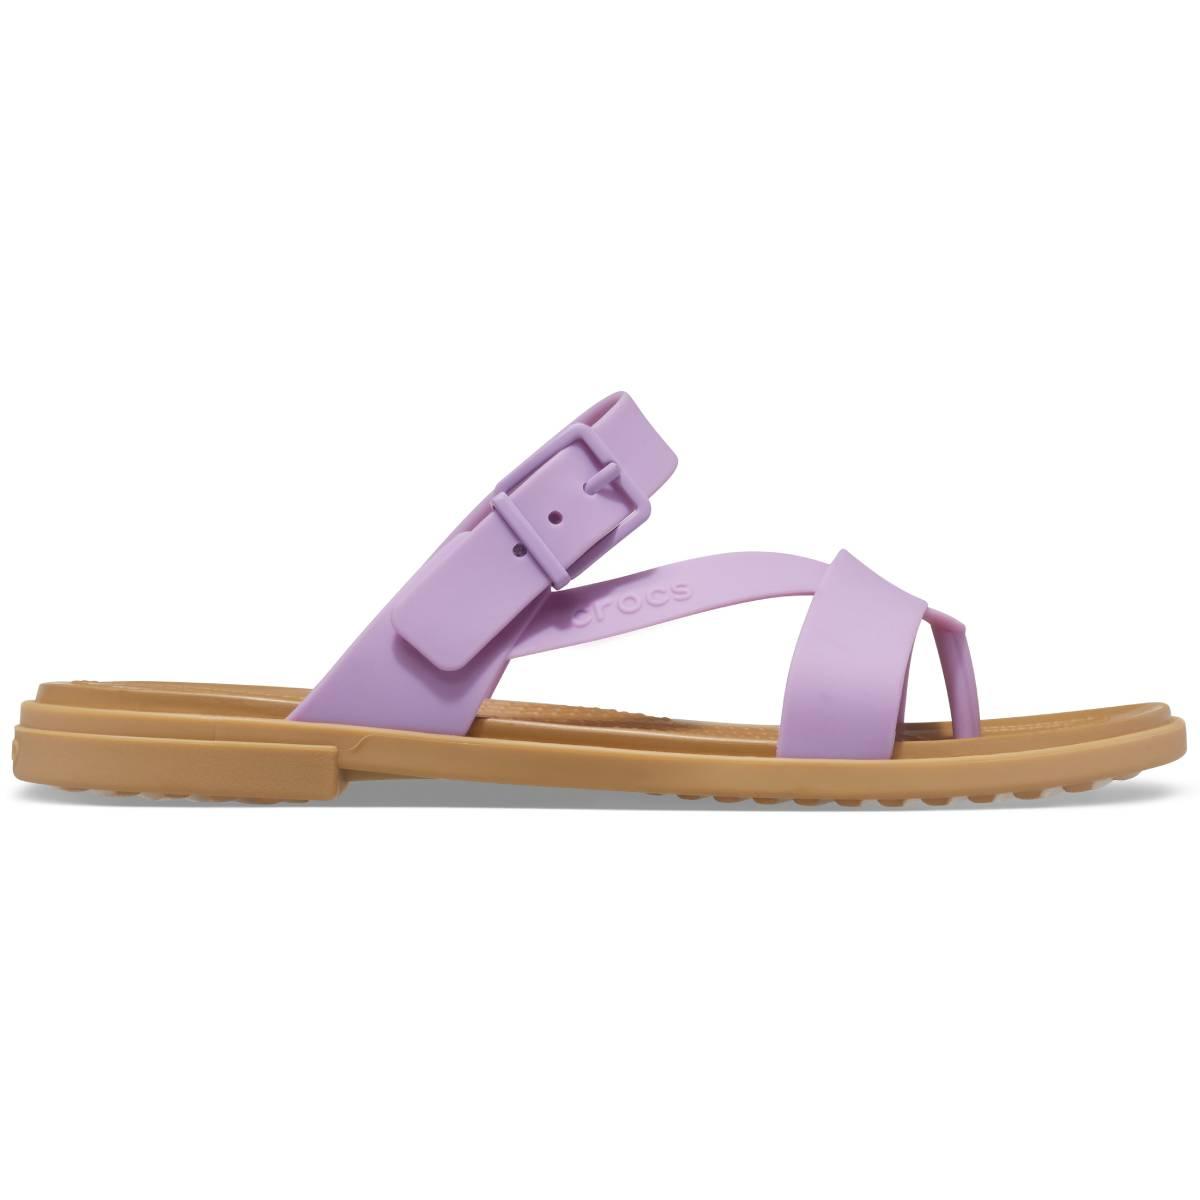 Crocs Tulum Toe Post Sandal W - Orchid